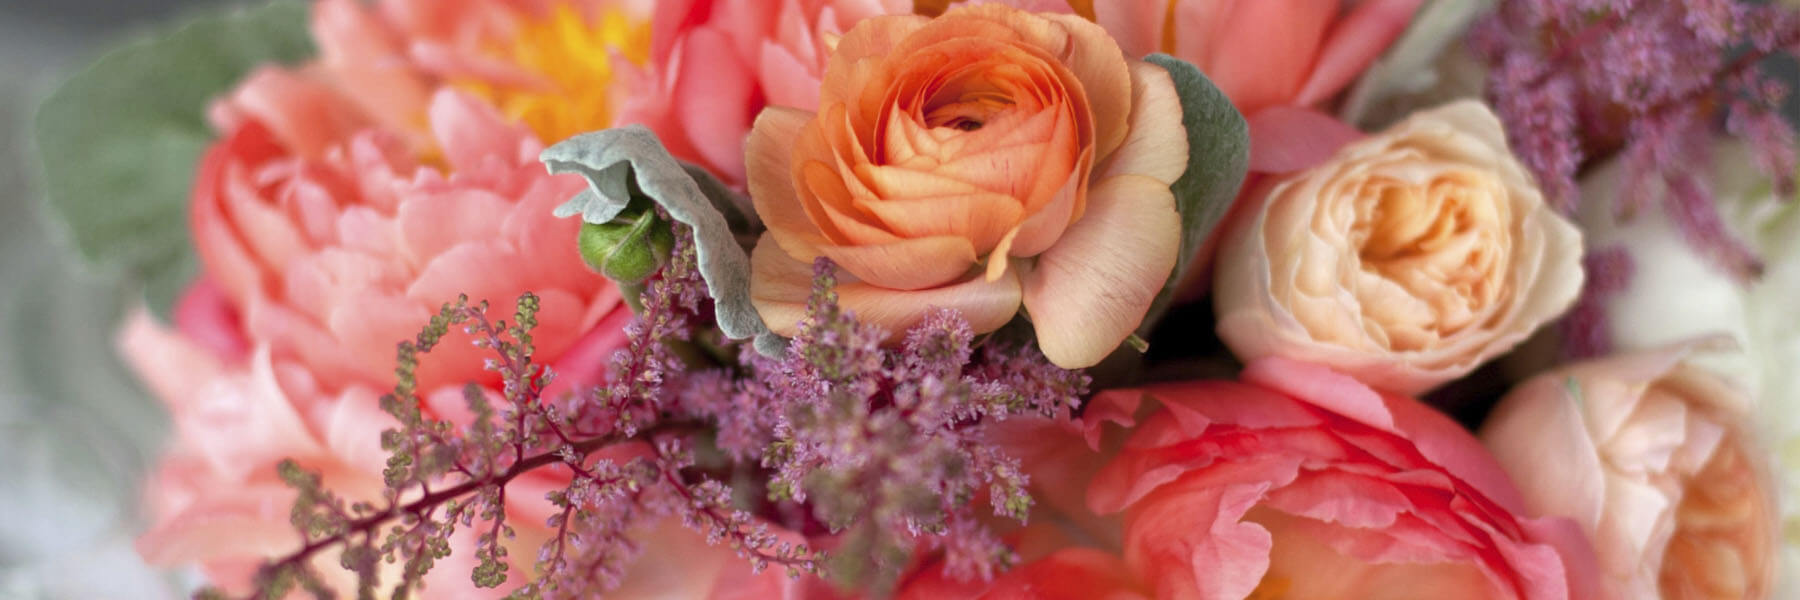 copper-penny-flowers_01